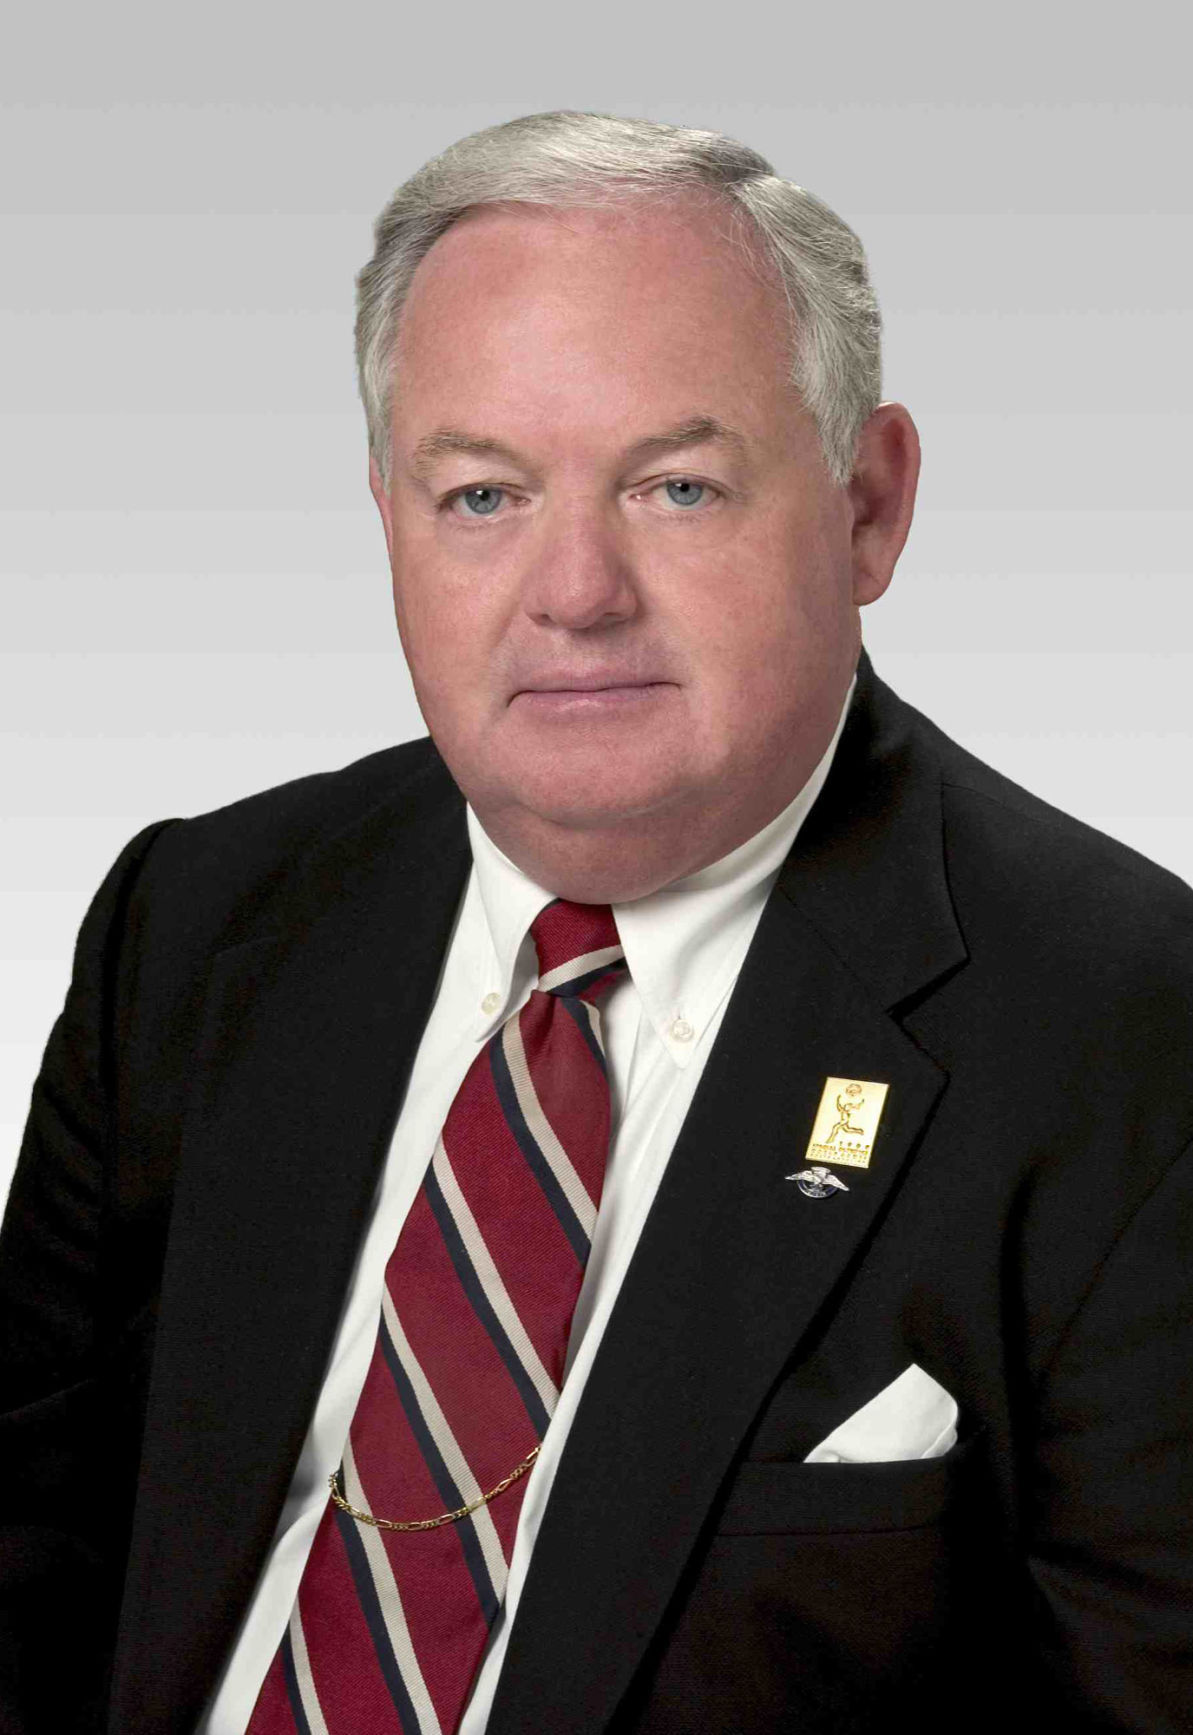 Bill Whiteheart